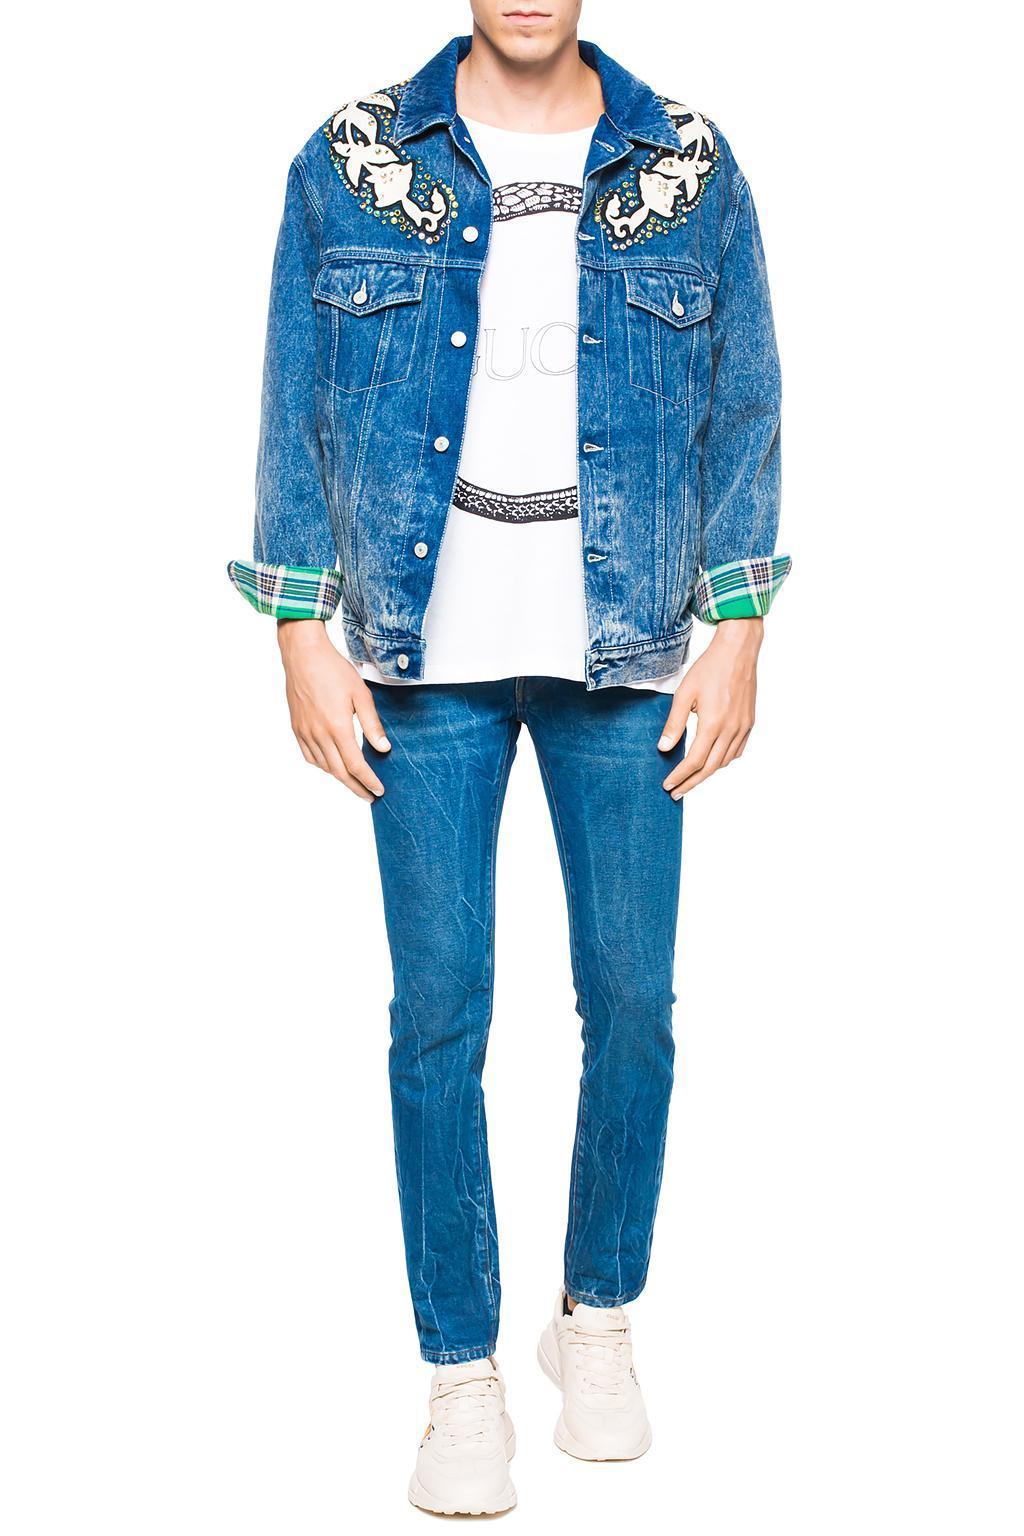 994cf4a95 Gucci - Blue Denim Jacket With Logo for Men - Lyst. View fullscreen